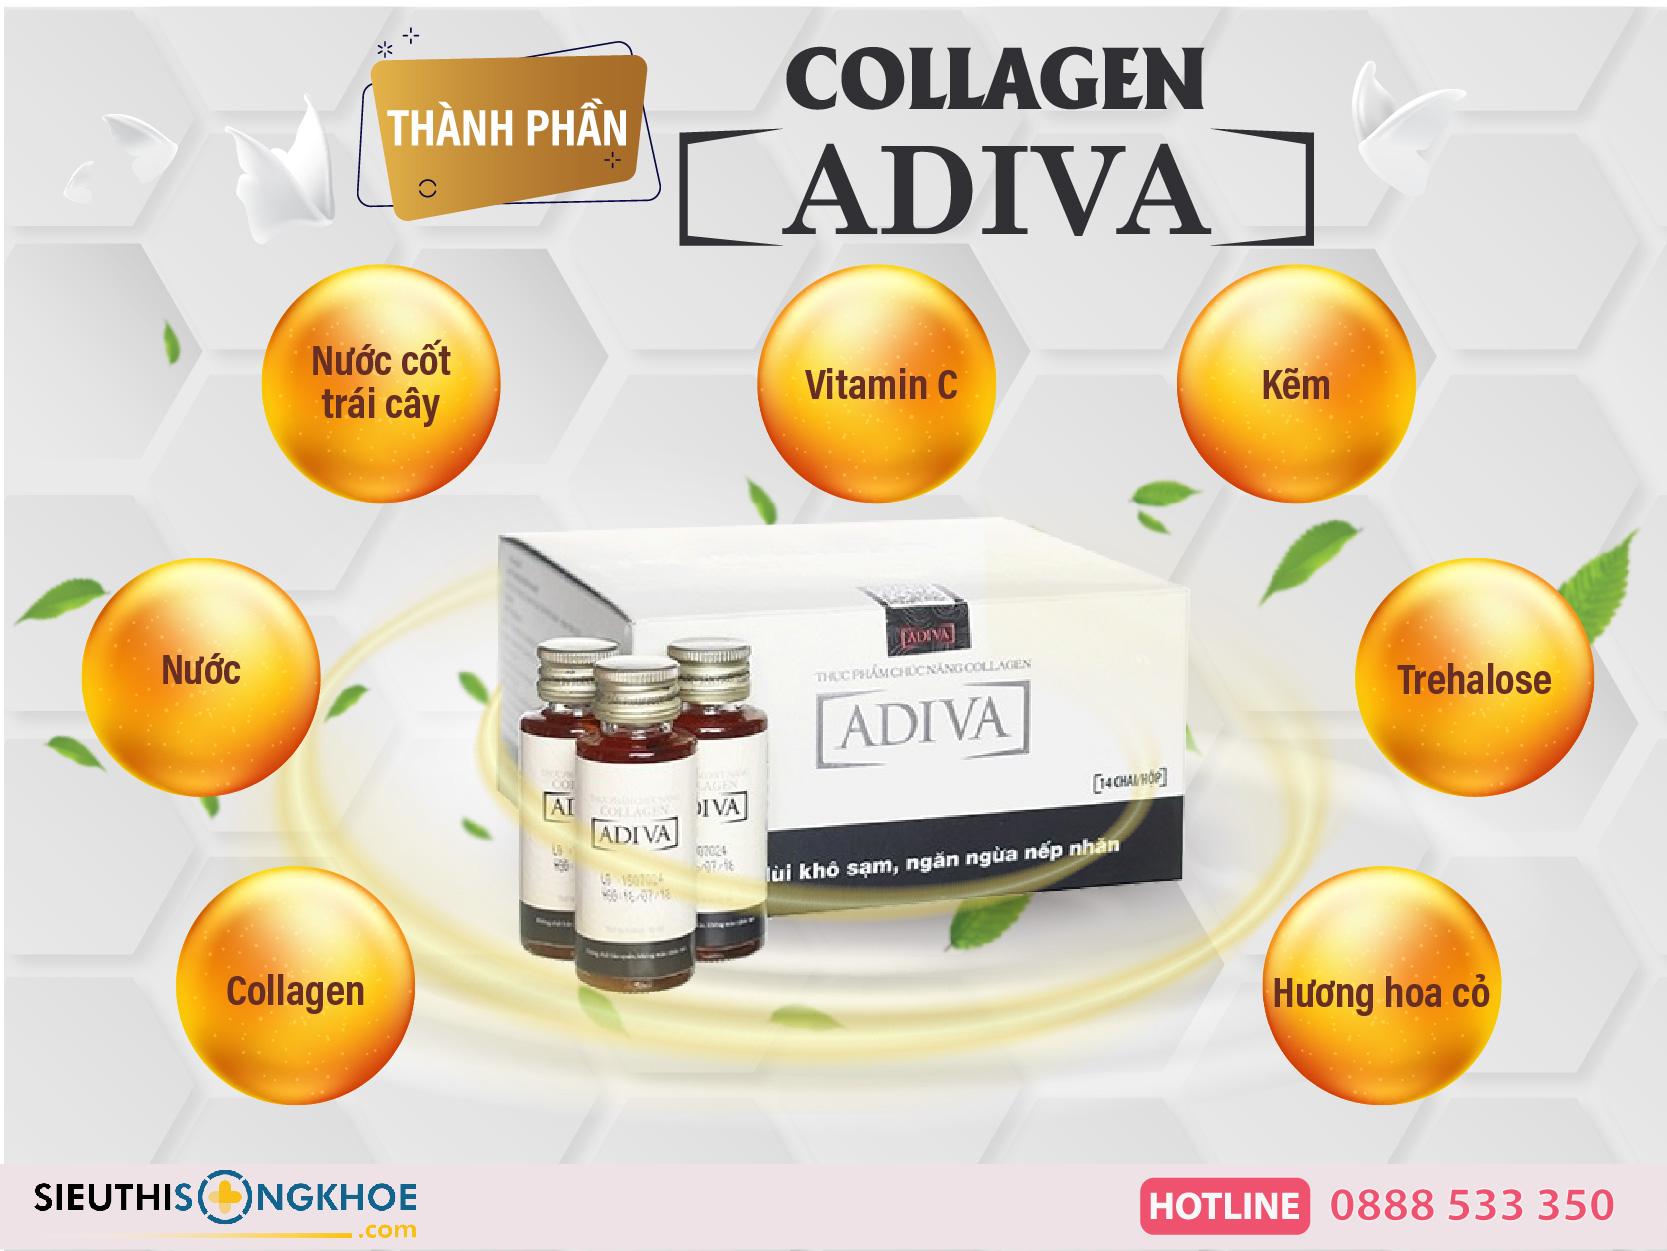 thanh phan nuoc collagen adiva